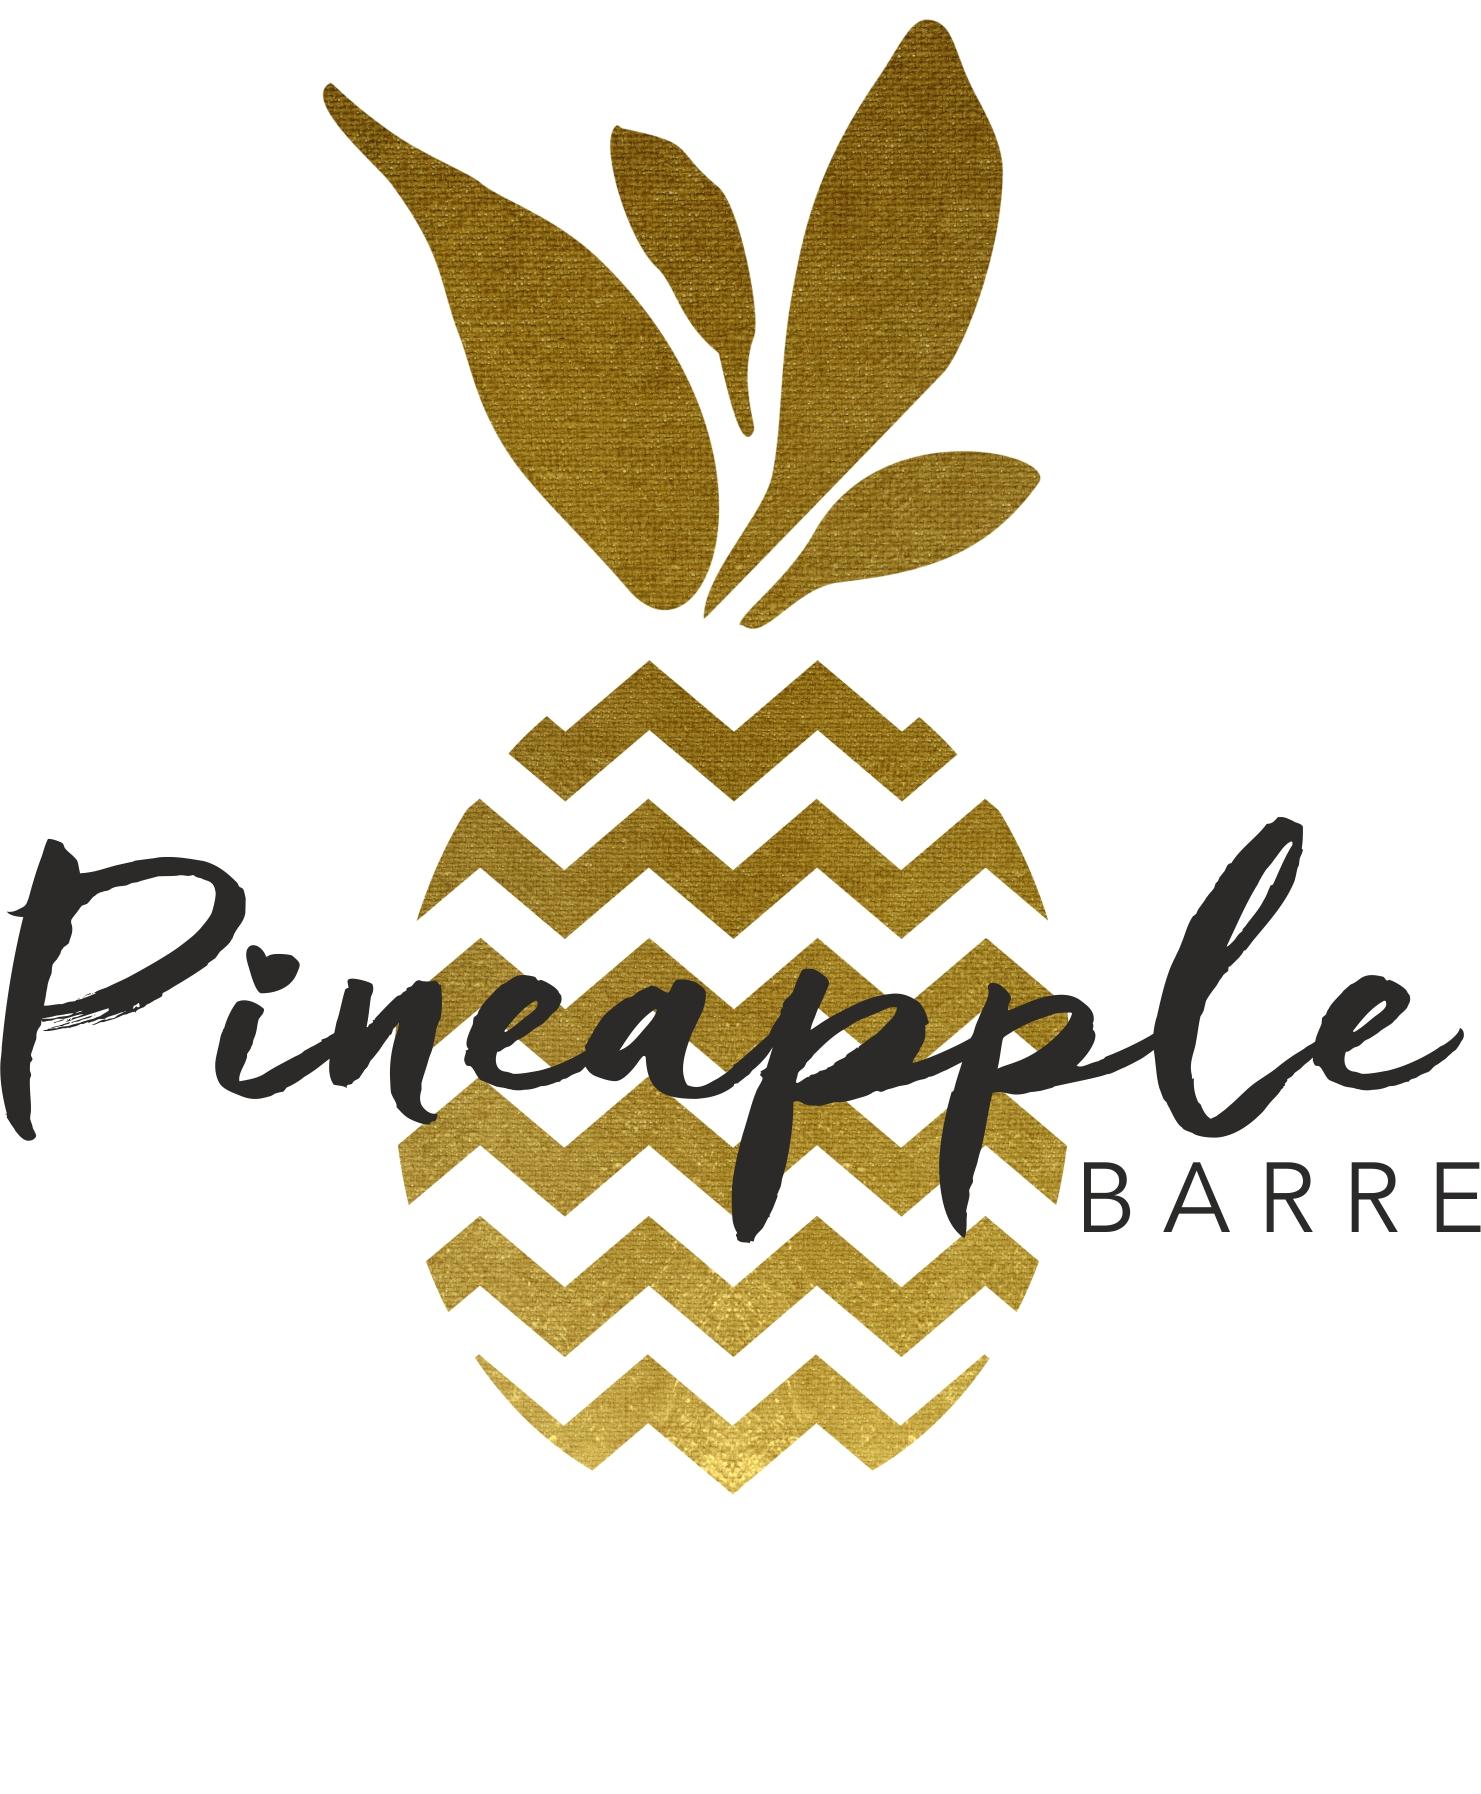 Client: Pineapple Barre Socks